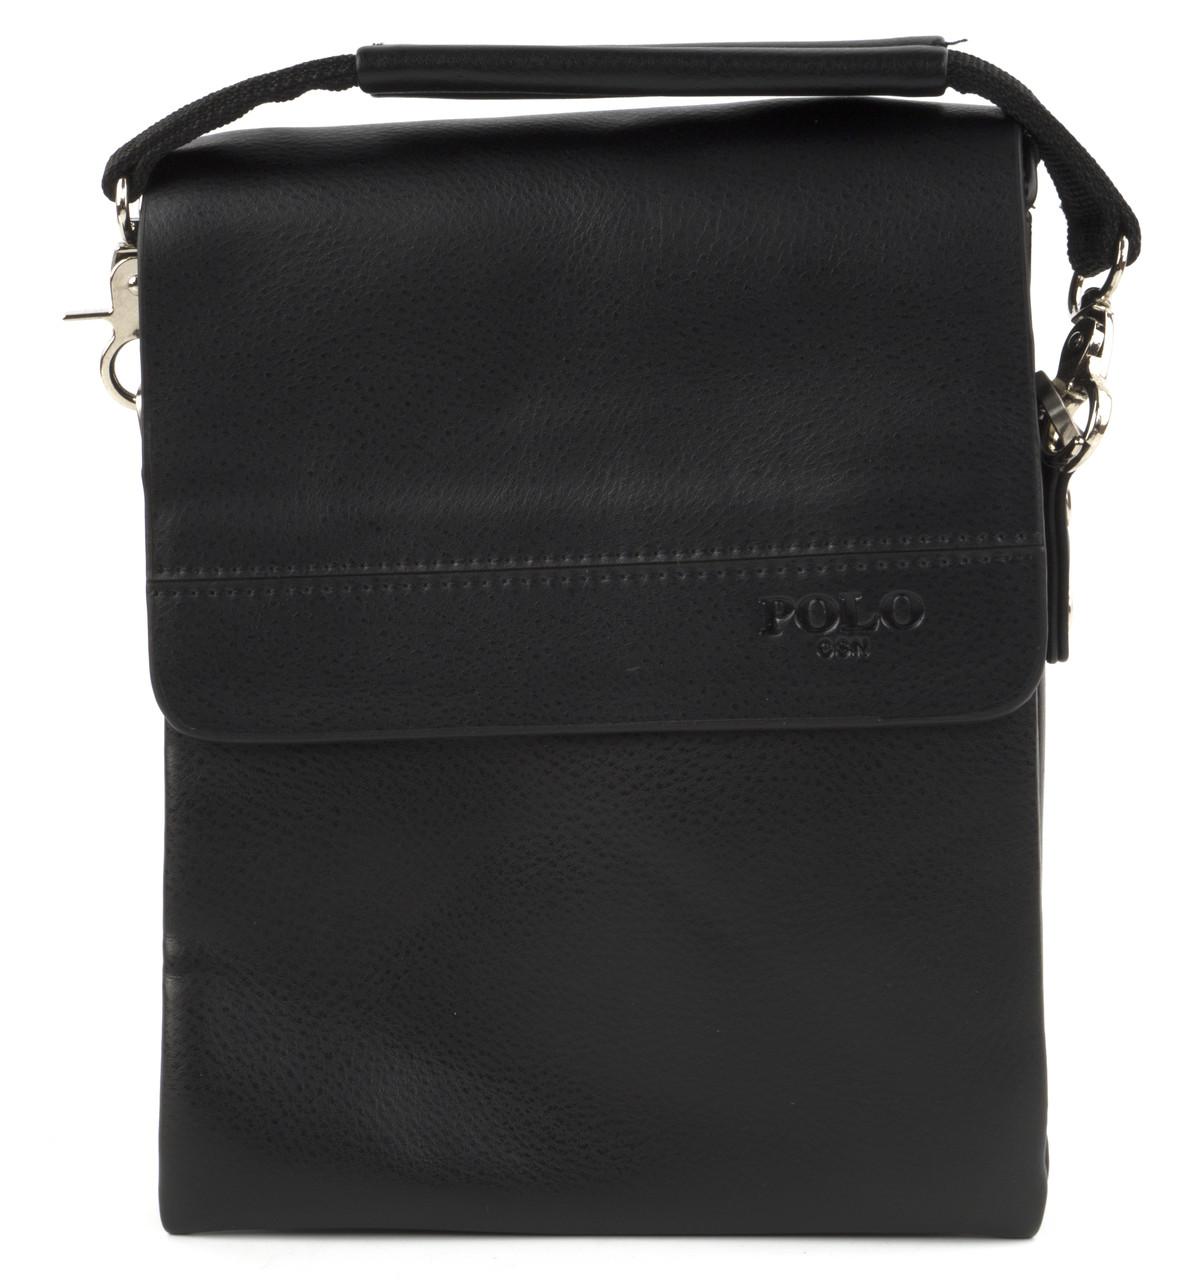 Удобная мужская стильная сумка Polo art. 3385-1 черный